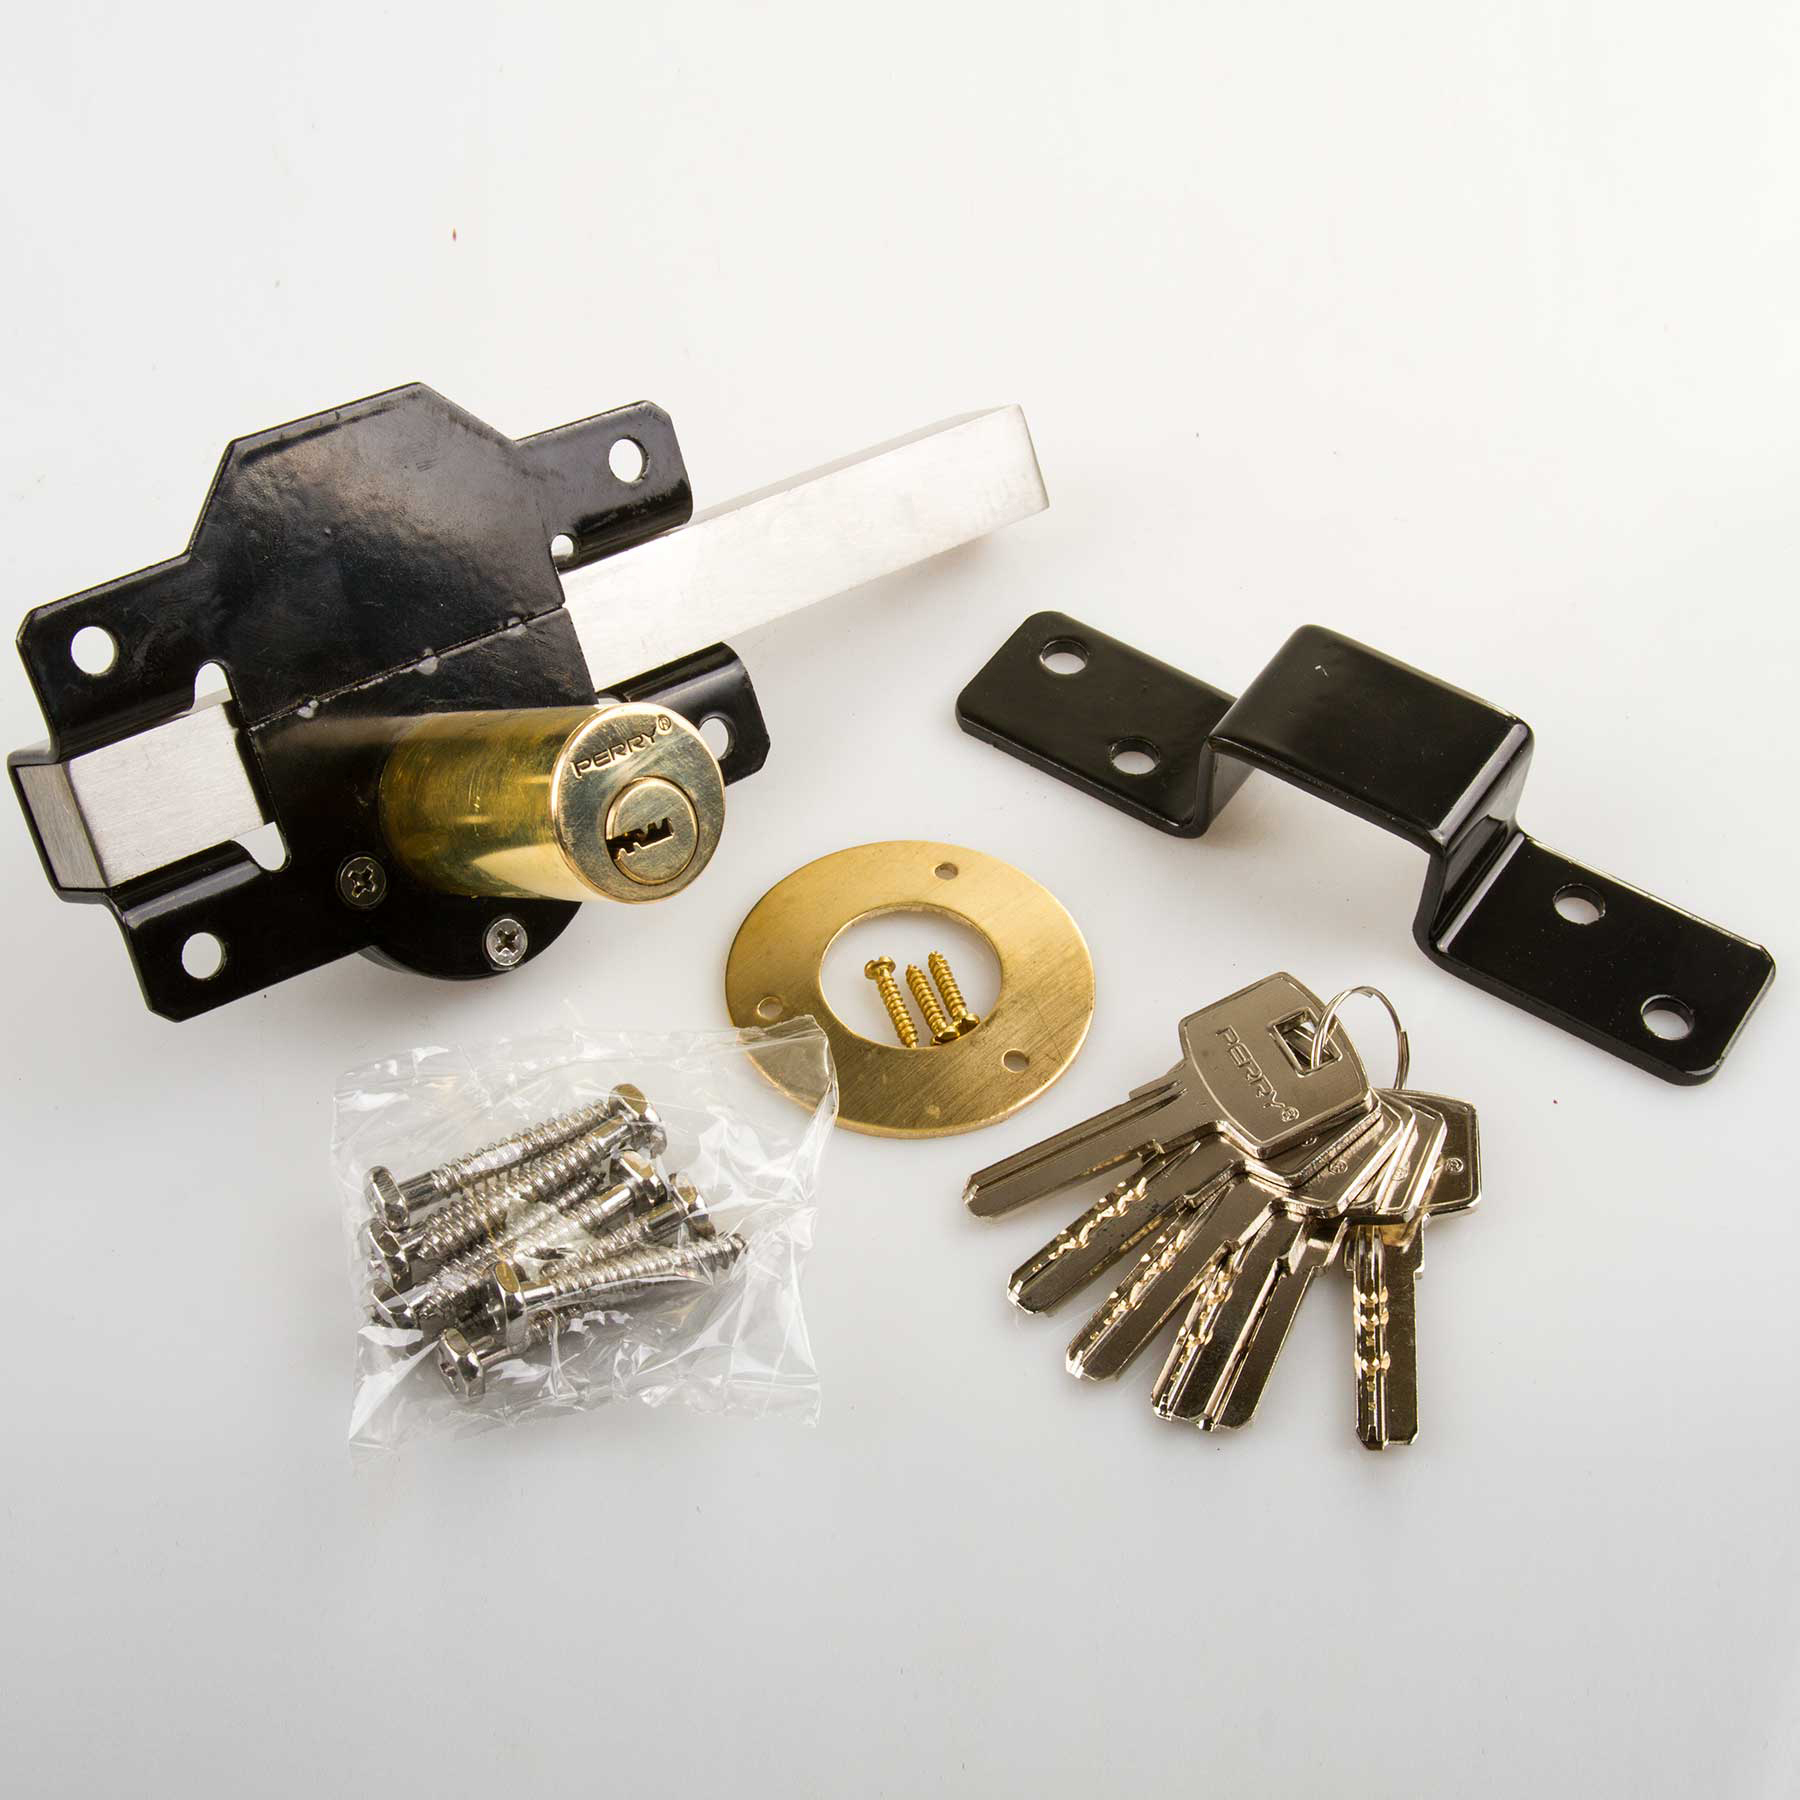 Long Lever Locking Locking Bar : Garden gate mm long throw lock for shed garage with